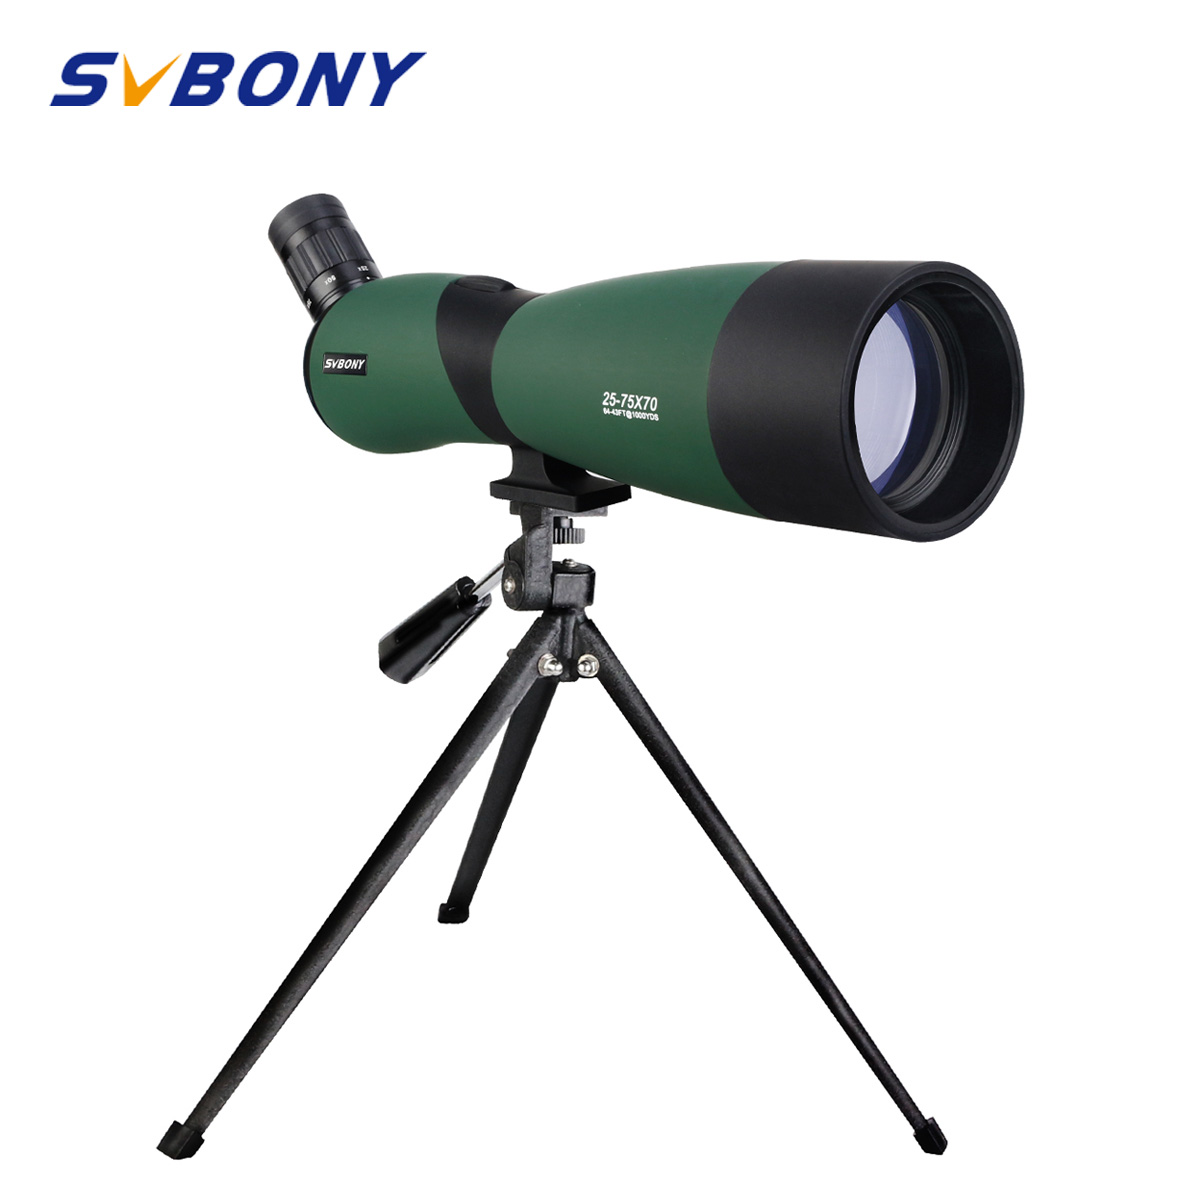 SVBONY SV403 Zoom 20-60X60/25-75x70mm Spotting Scope Multi-Coated Optics Telescópio Monocular para observação de aves w/Tripé de Mesa